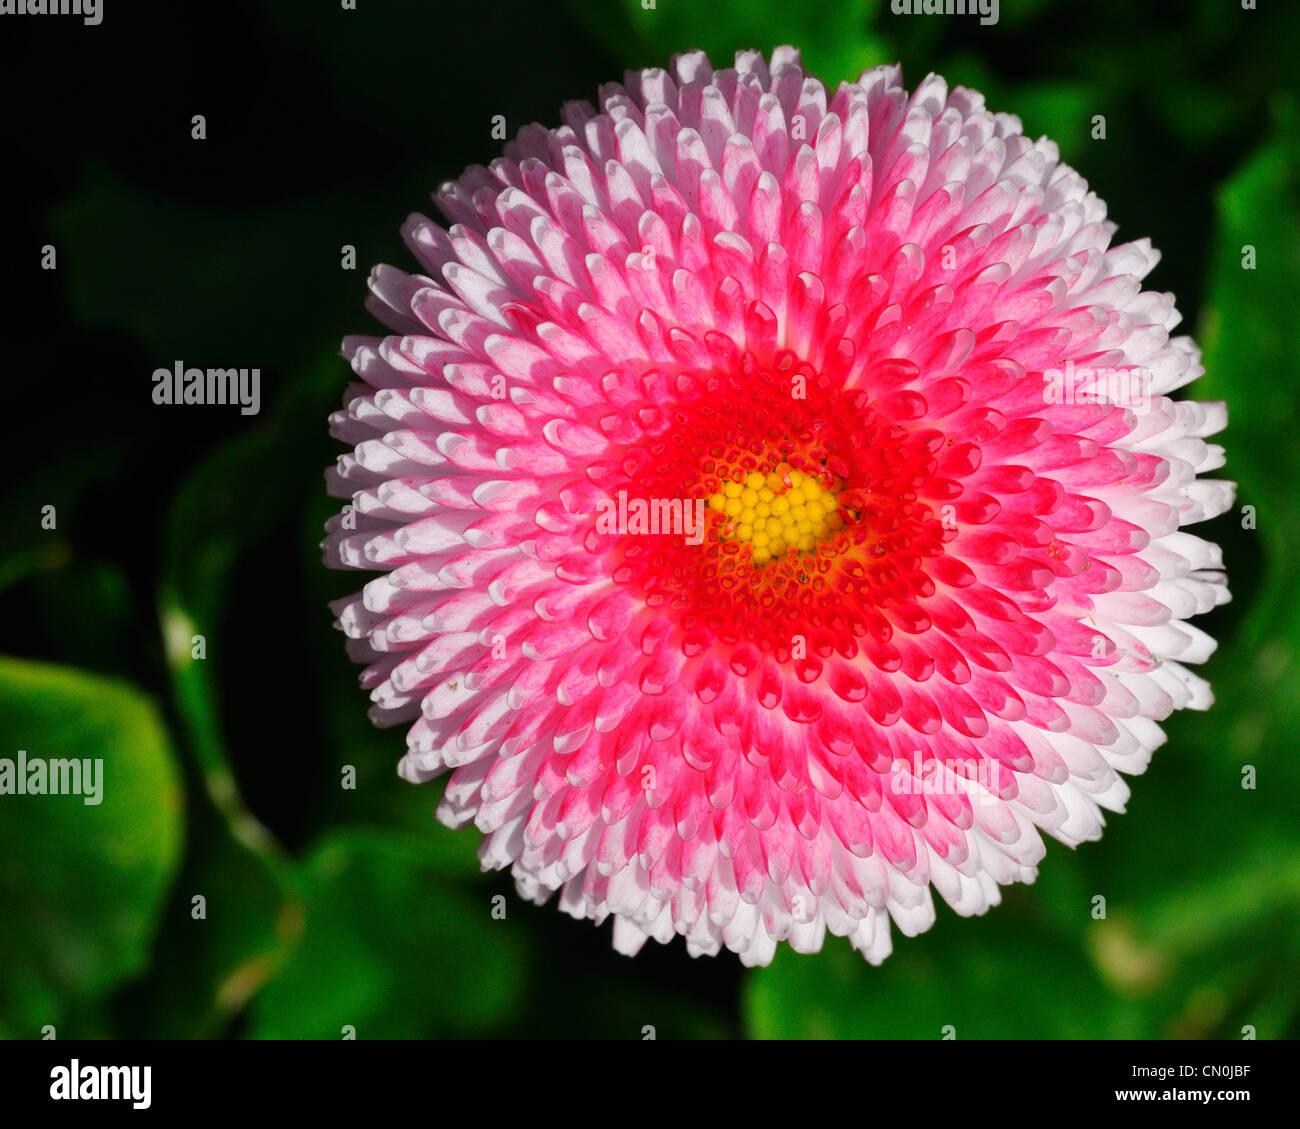 English daisy pink stock photos english daisy pink stock images a pink english daisy flower asteraceae bellis perennis at the rose garden in izmirmasajfo